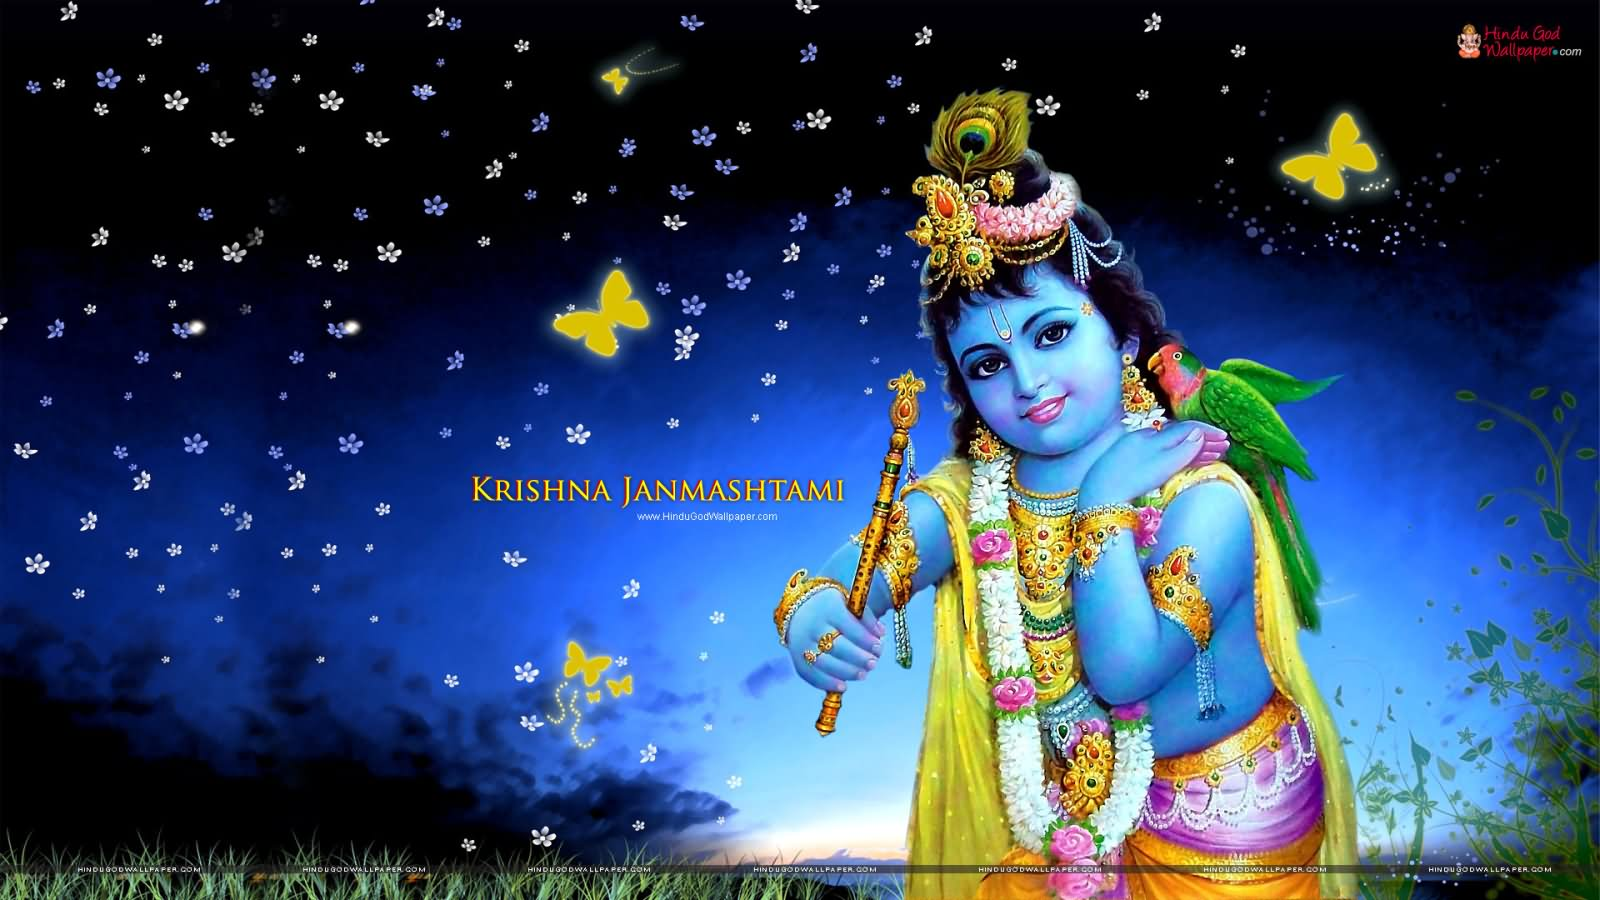 Sri krishna jayanti wallpaper - Wish You Very Happy Krishna Janmashtami 2016